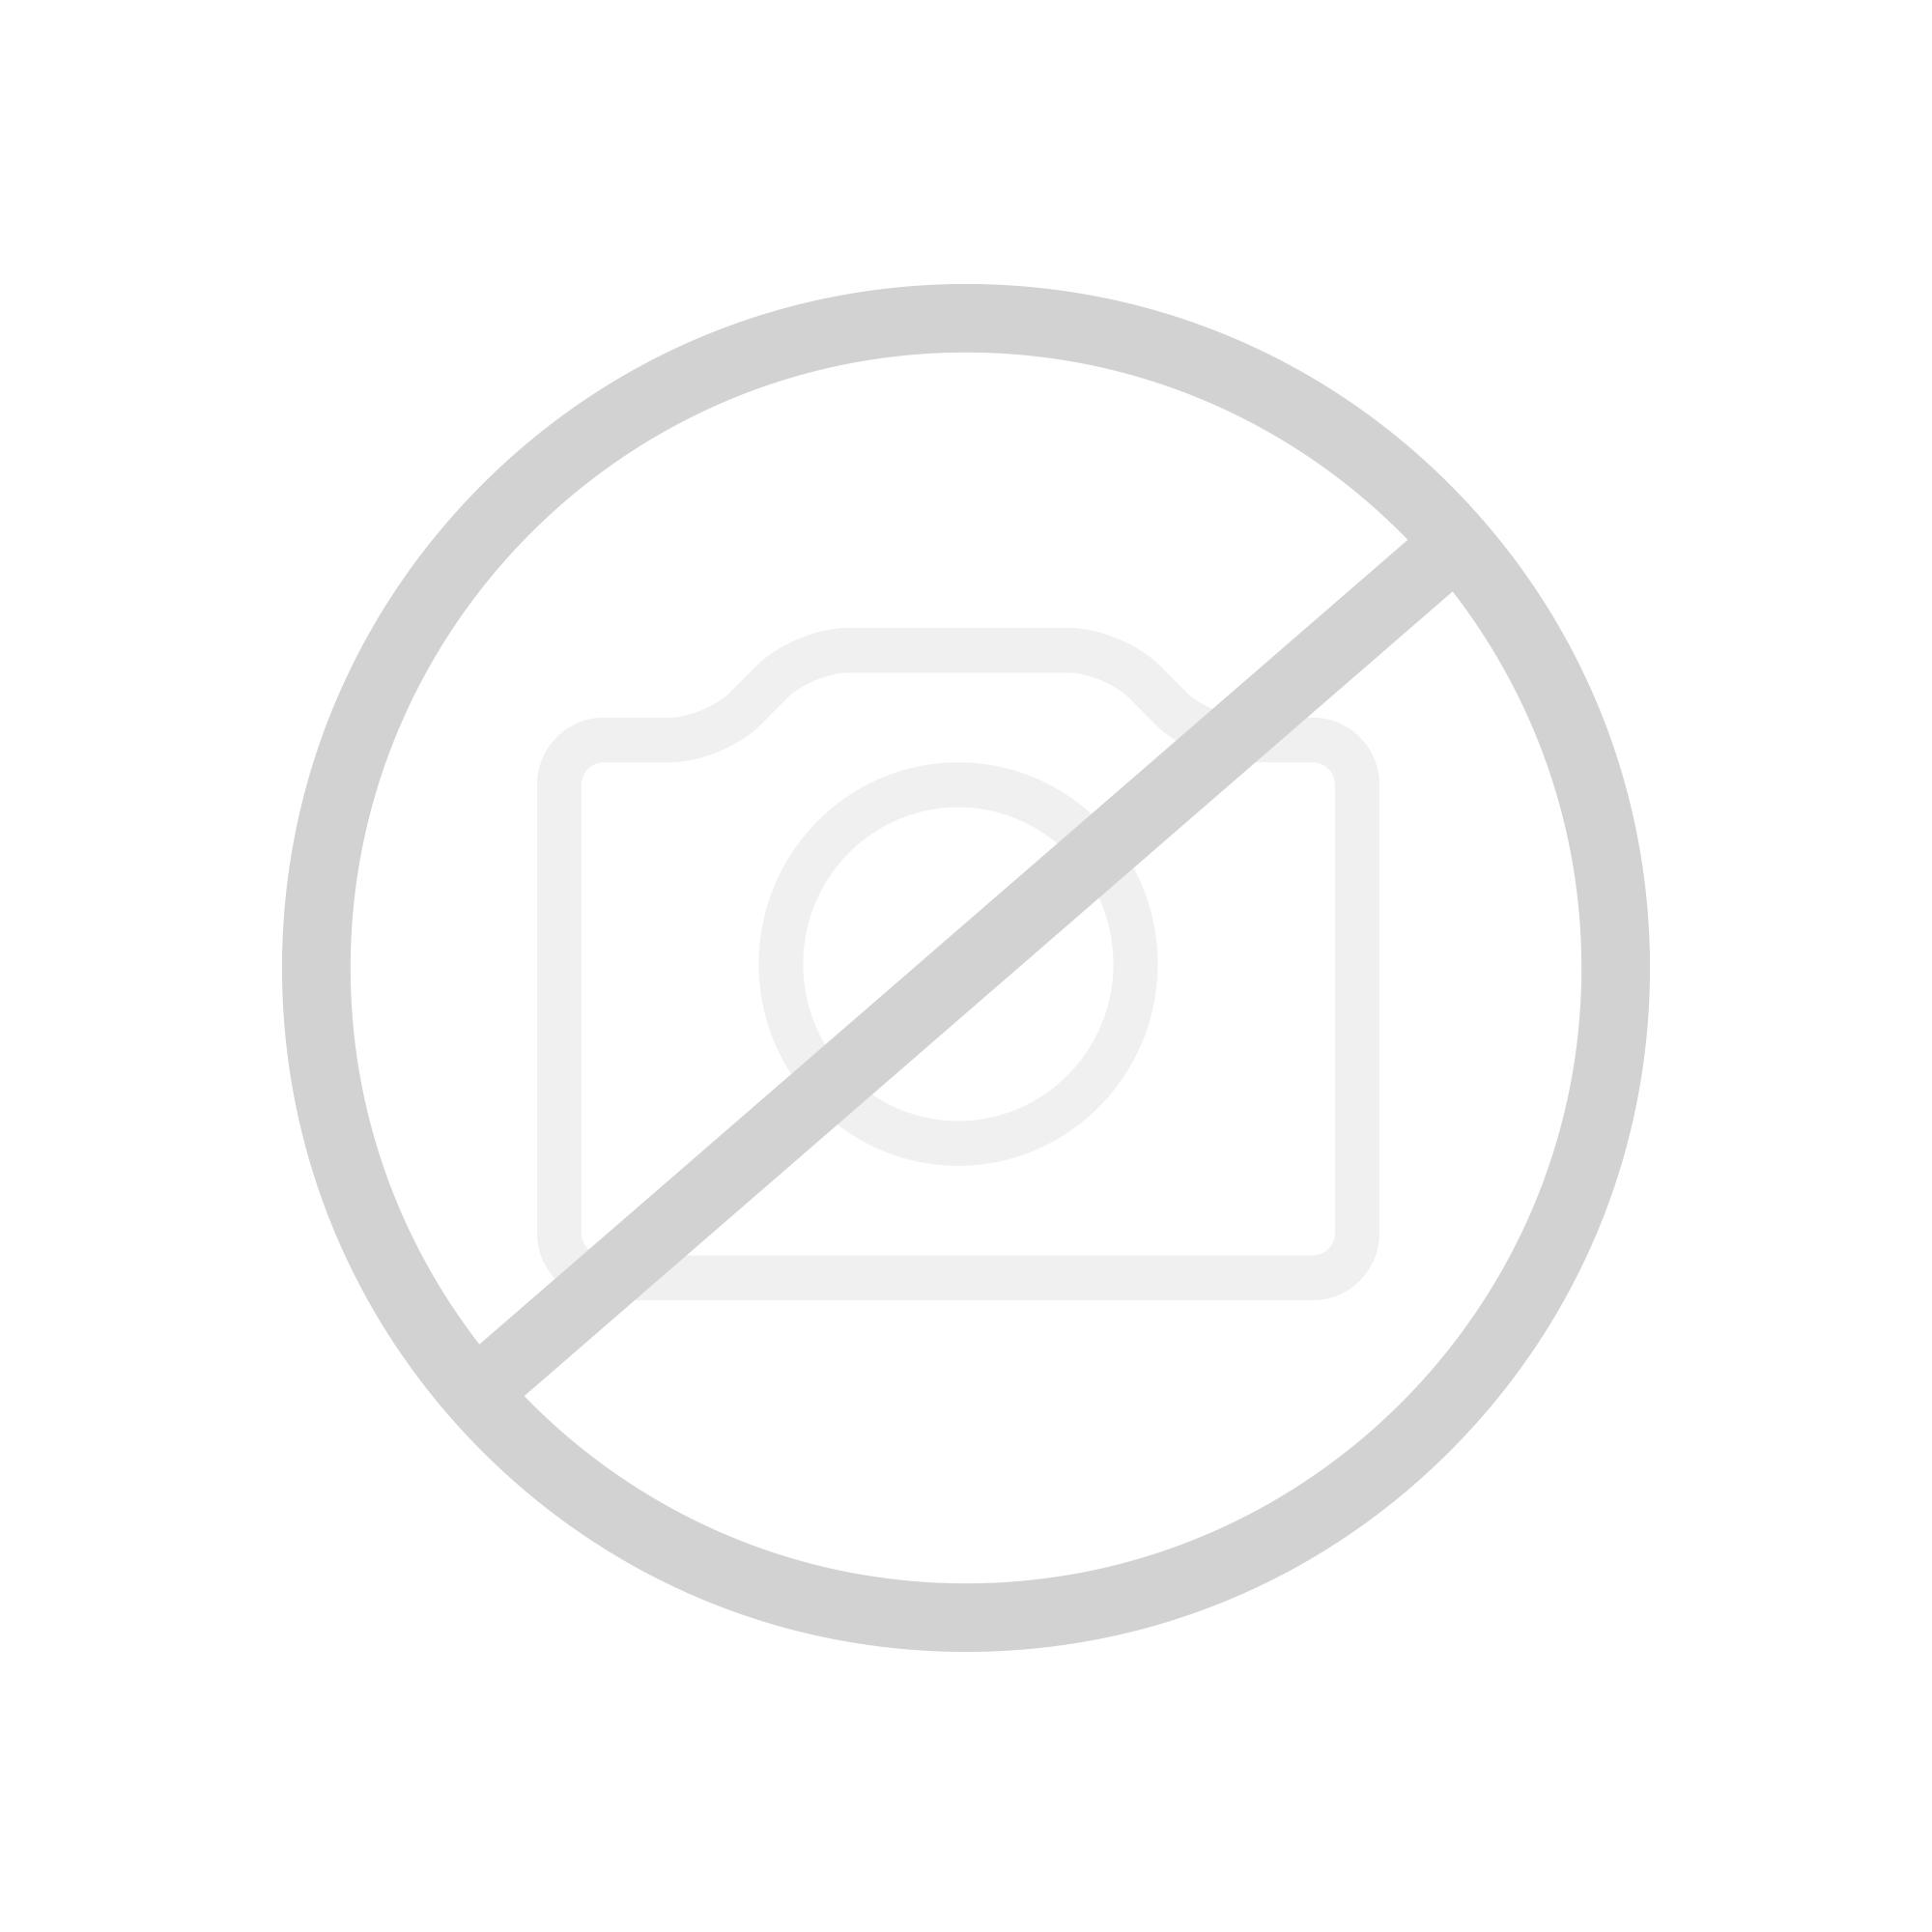 Hansgrohe PuraVida Unica Set 900 mm DN15 weiß/chrom